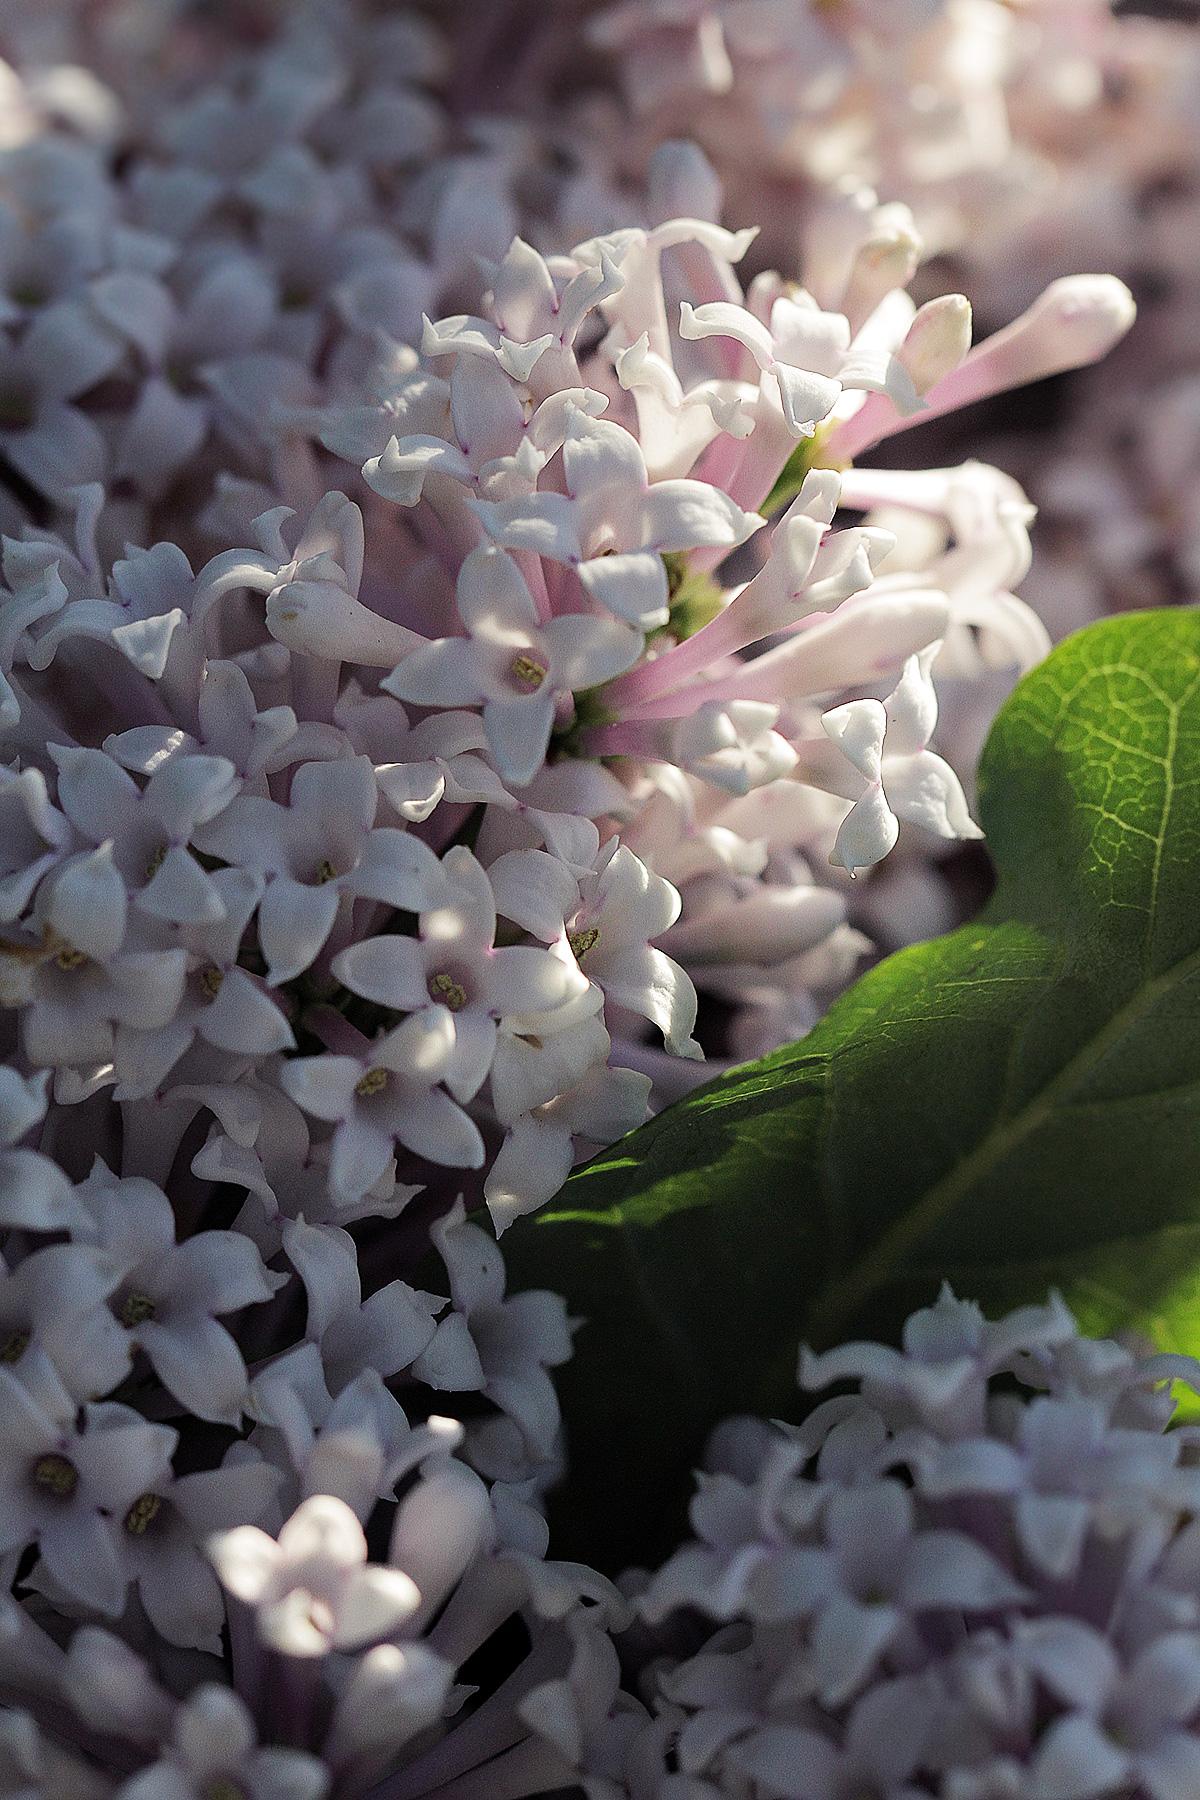 lilac-lilac-flowers.jpg